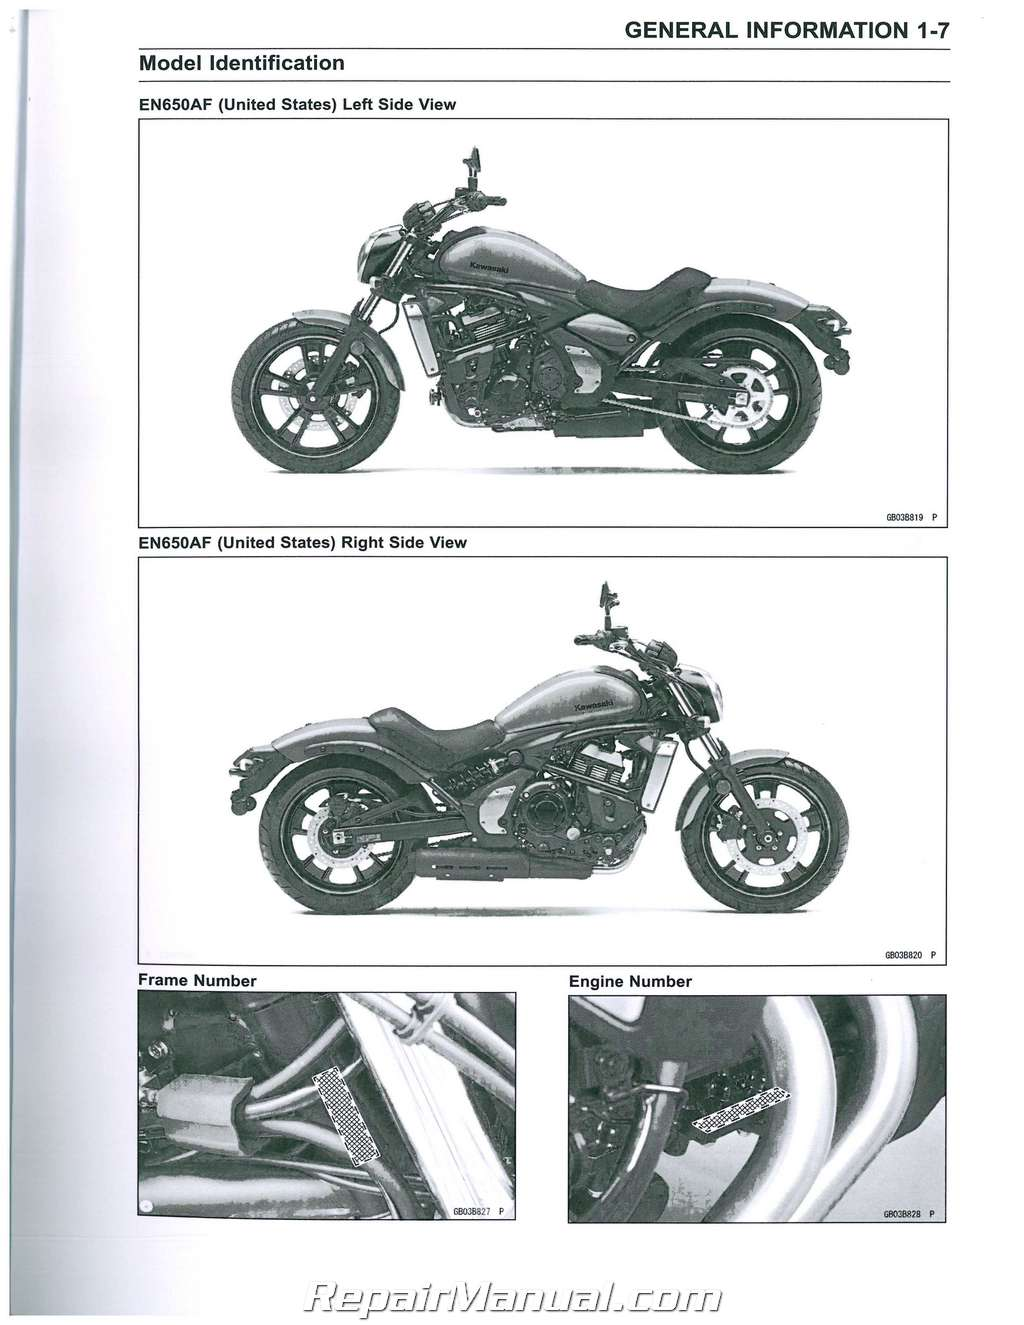 2015 kawasaki en650 vulcan s / abs motorcycle service manual